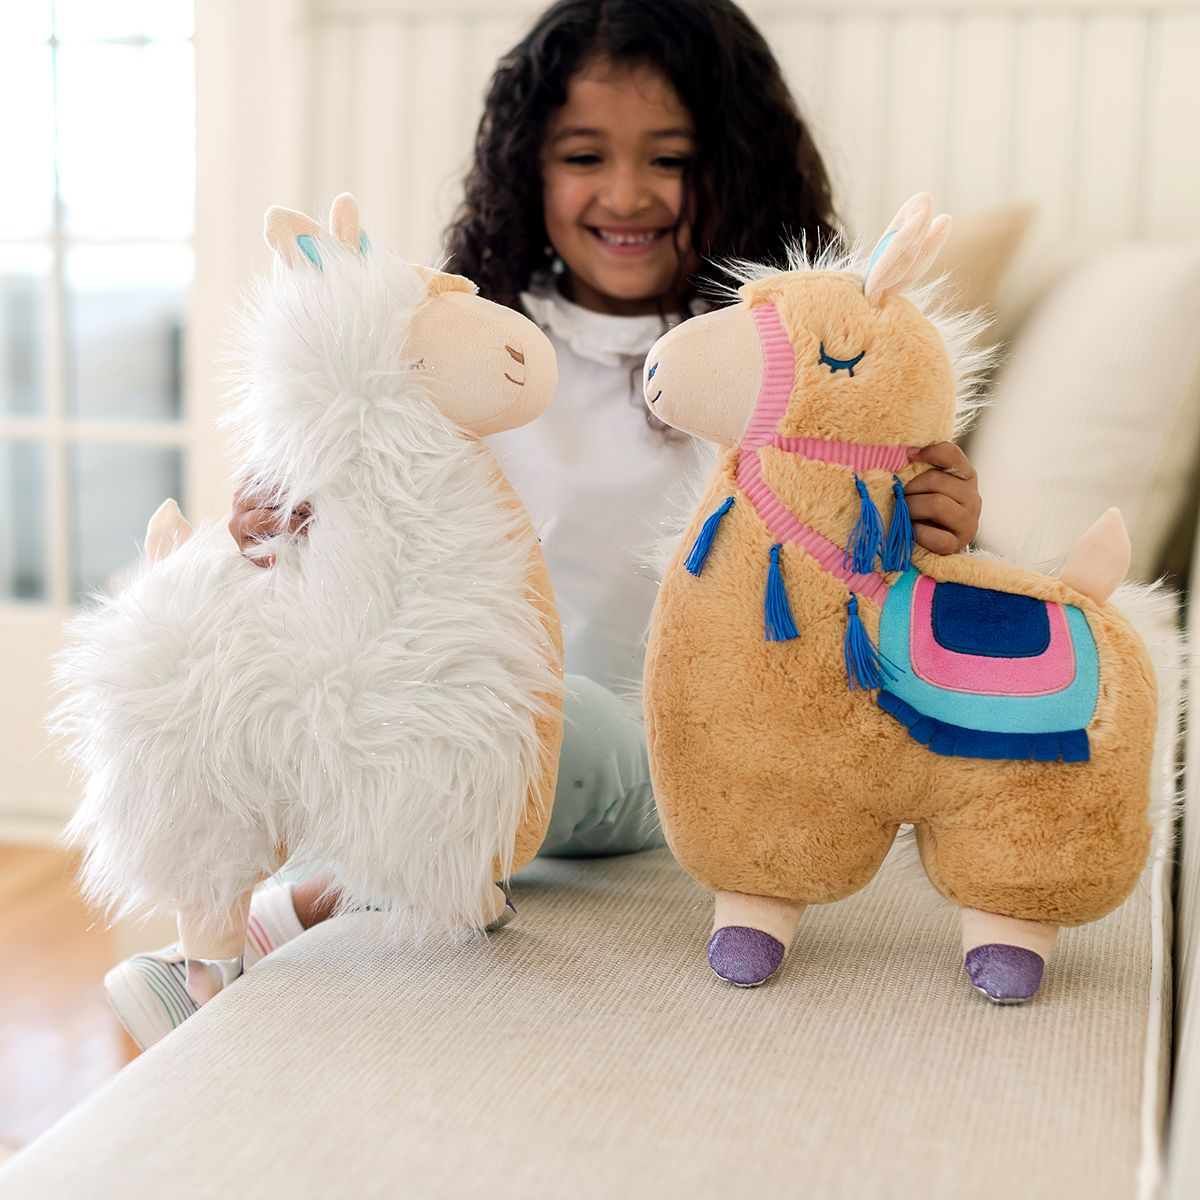 Animal Adventure Soft Landing Backflips Llama & Alpaca 2-in-1 Reversible Character Plush H8rGR